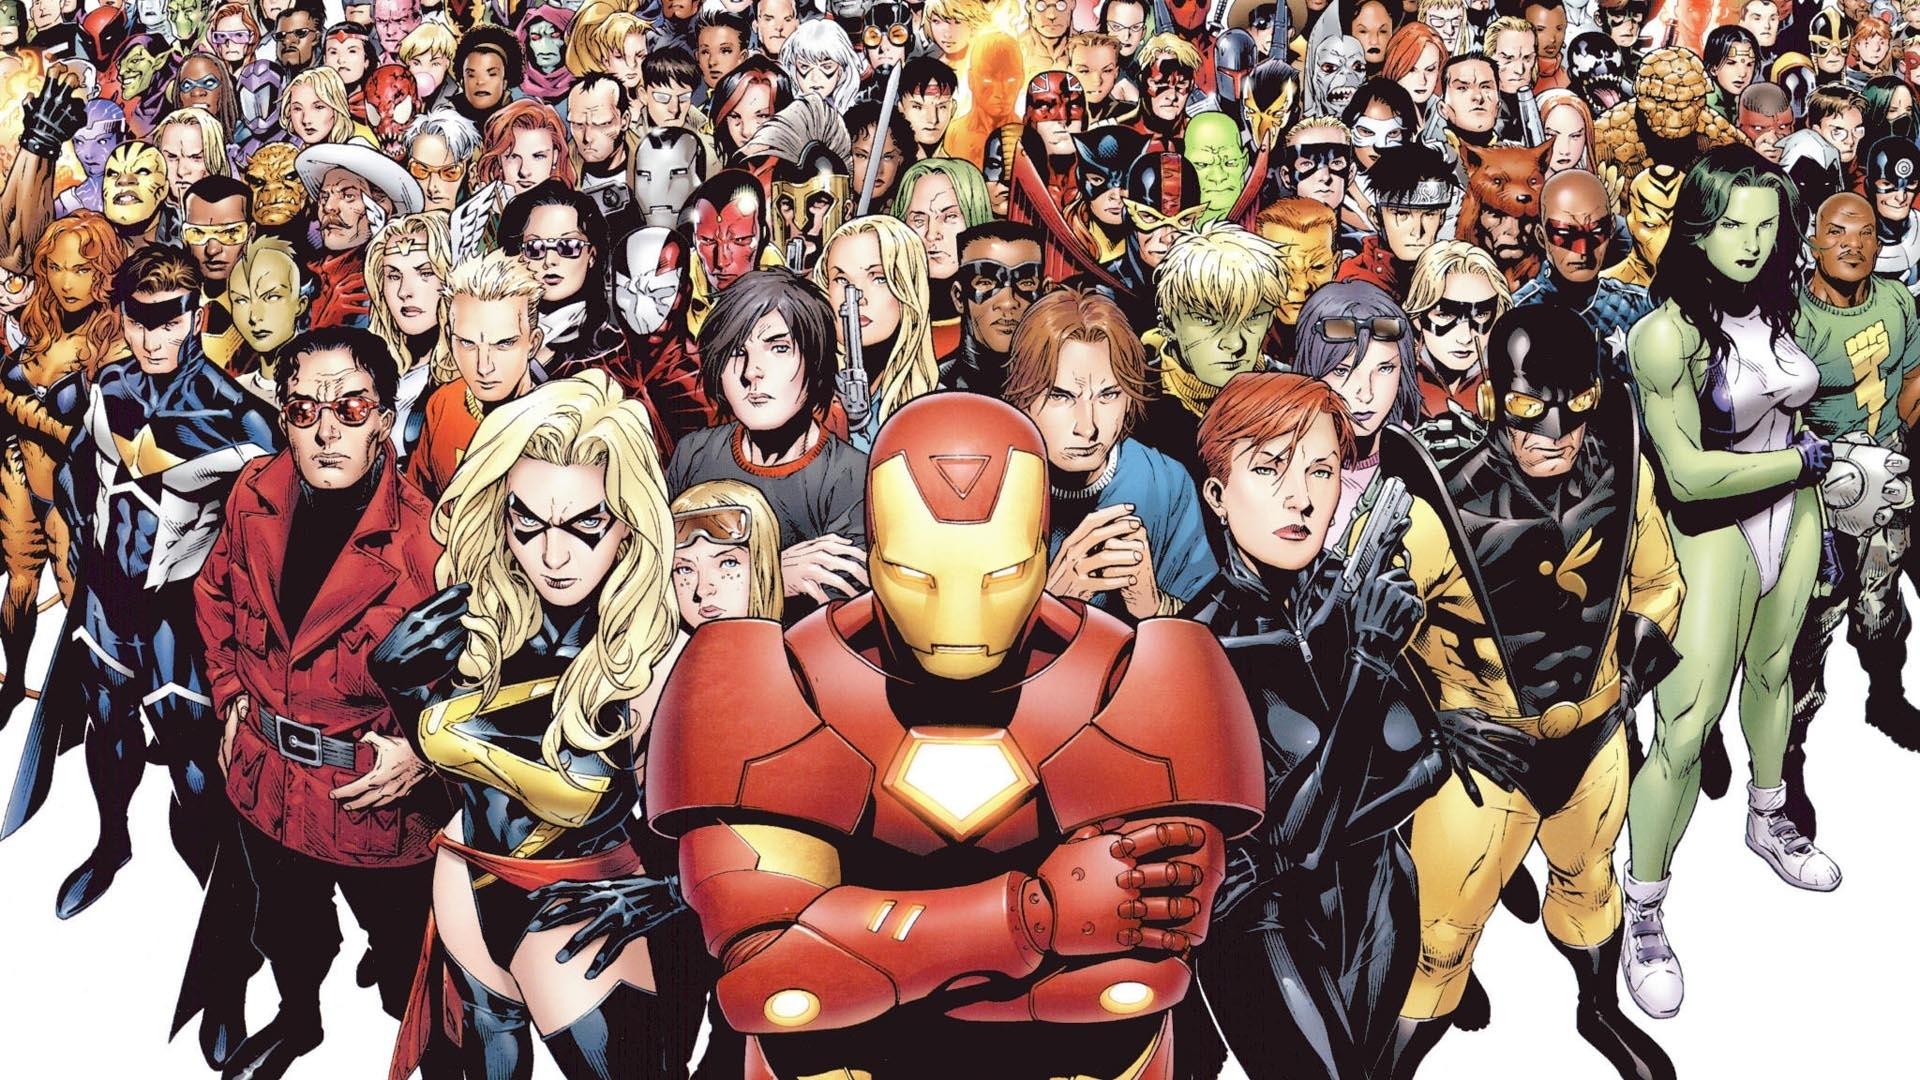 marvel comics comicboard hd wallpaper » fullhdwpp - full hd